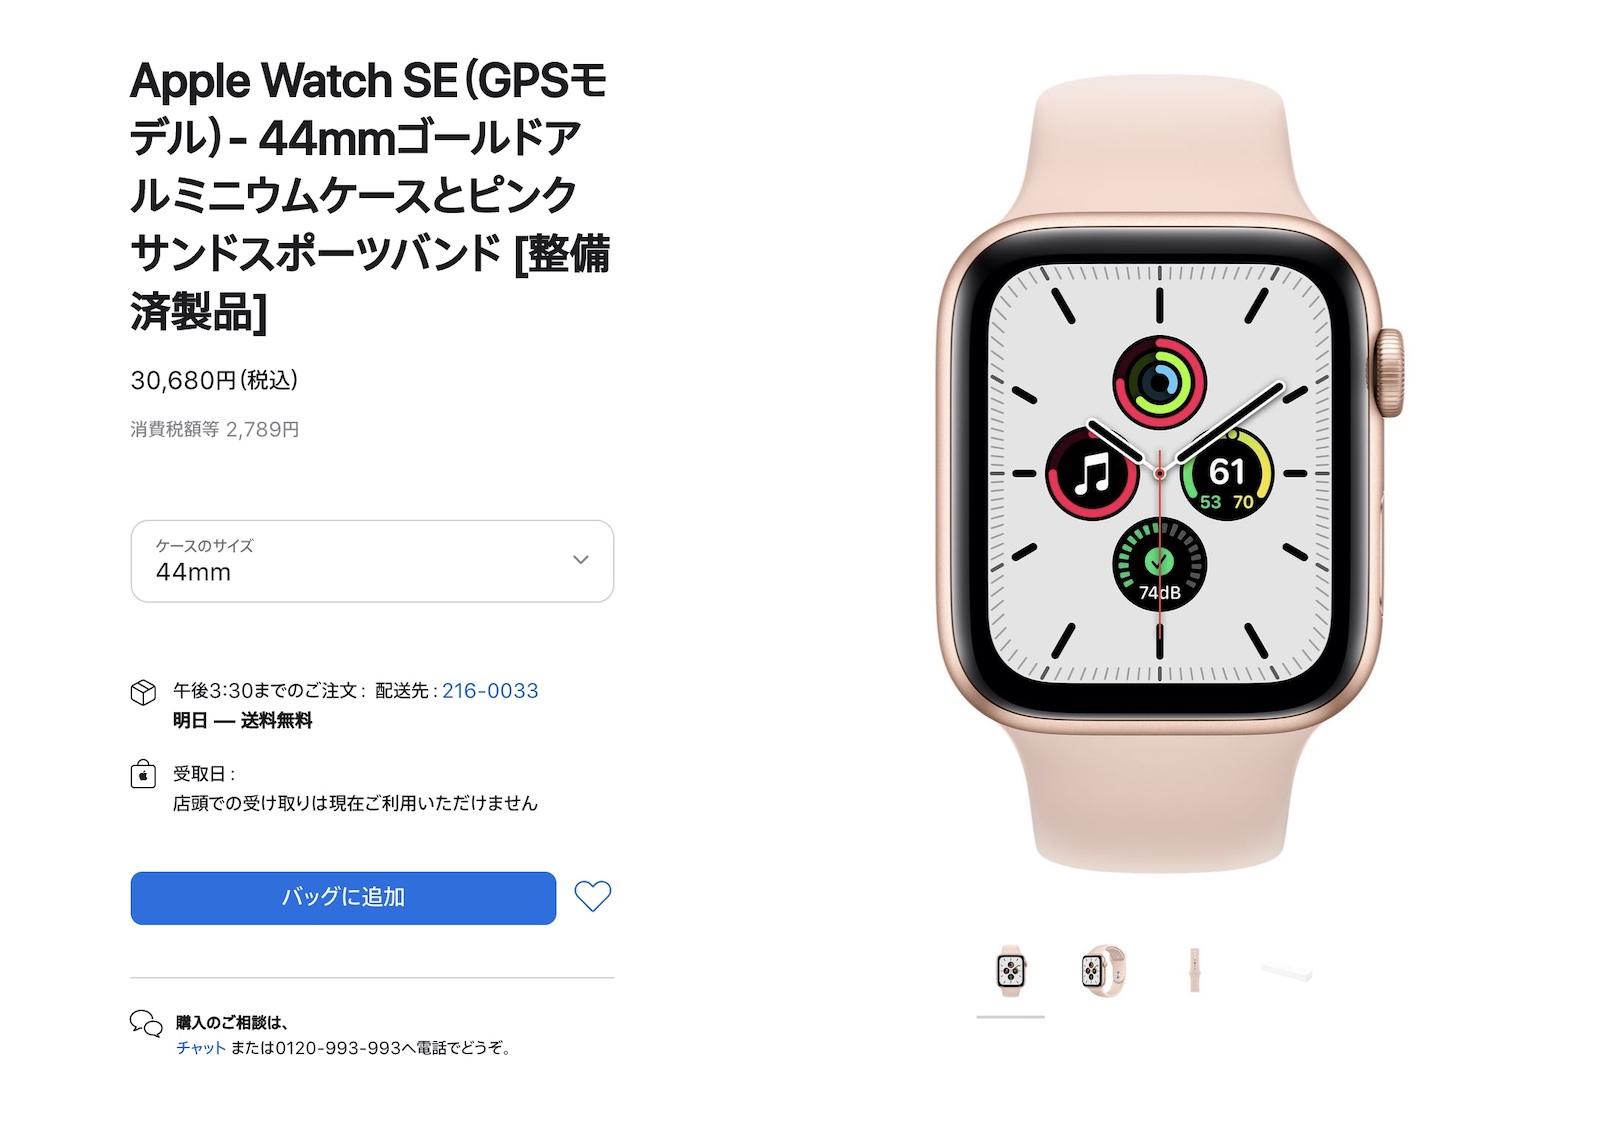 AppleWatch Refurbished model 2021 08 21